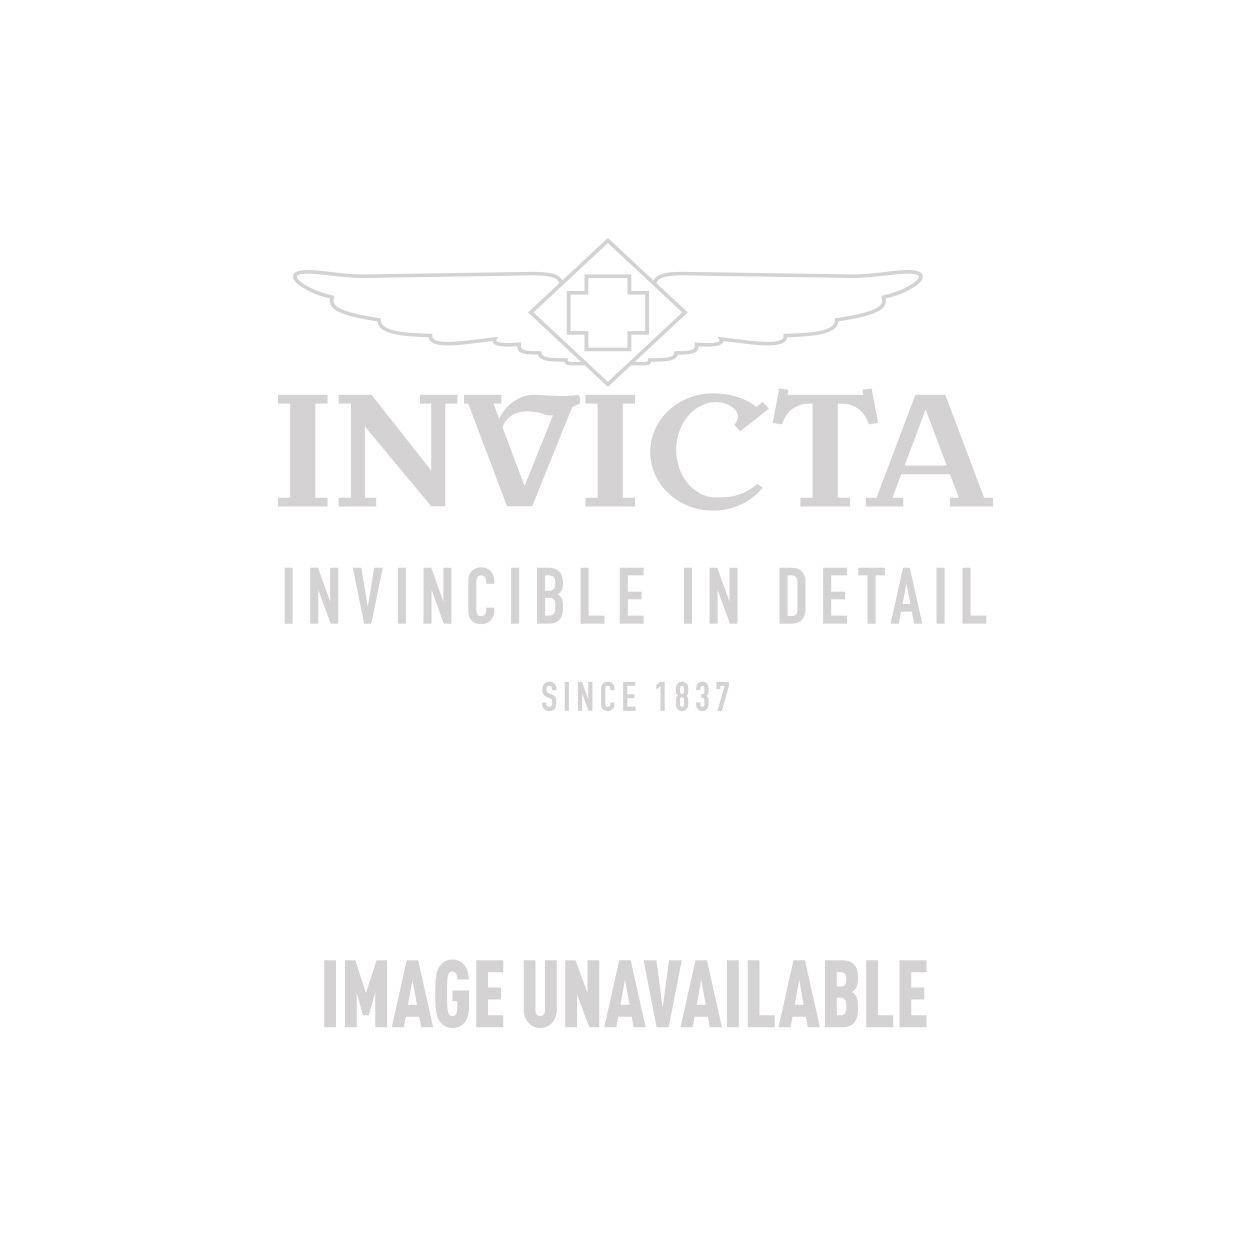 Invicta Sea Base Swiss Movement Quartz Watch - Gold case with Blue tone Polyurethane band - Model 20180